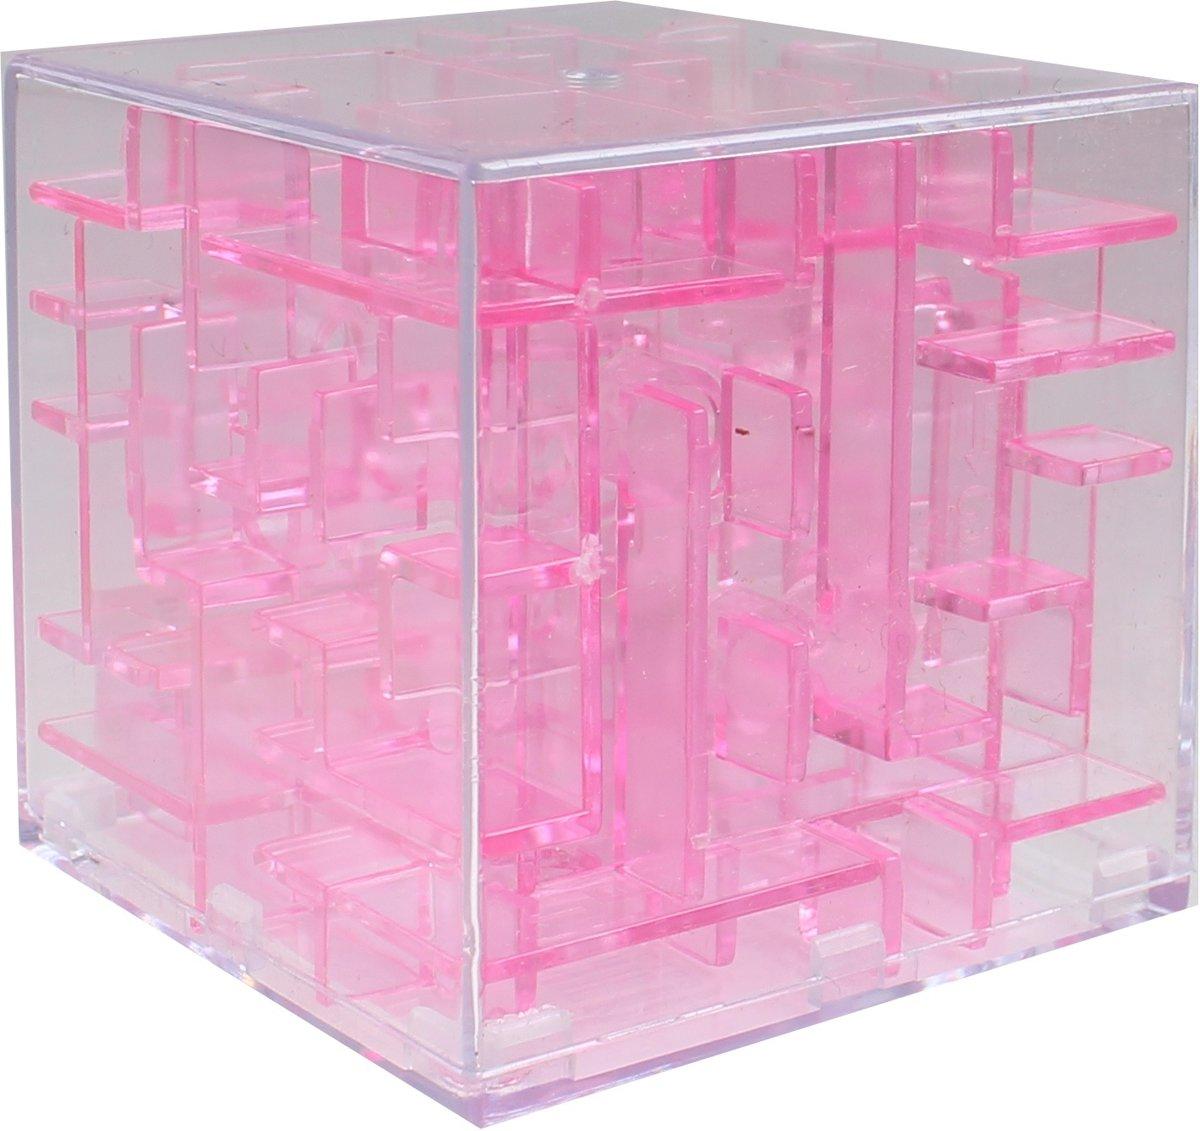 Tutti Frutti Mini-doolhof Transparant Roze 4 X 4 X 4 Cm kopen